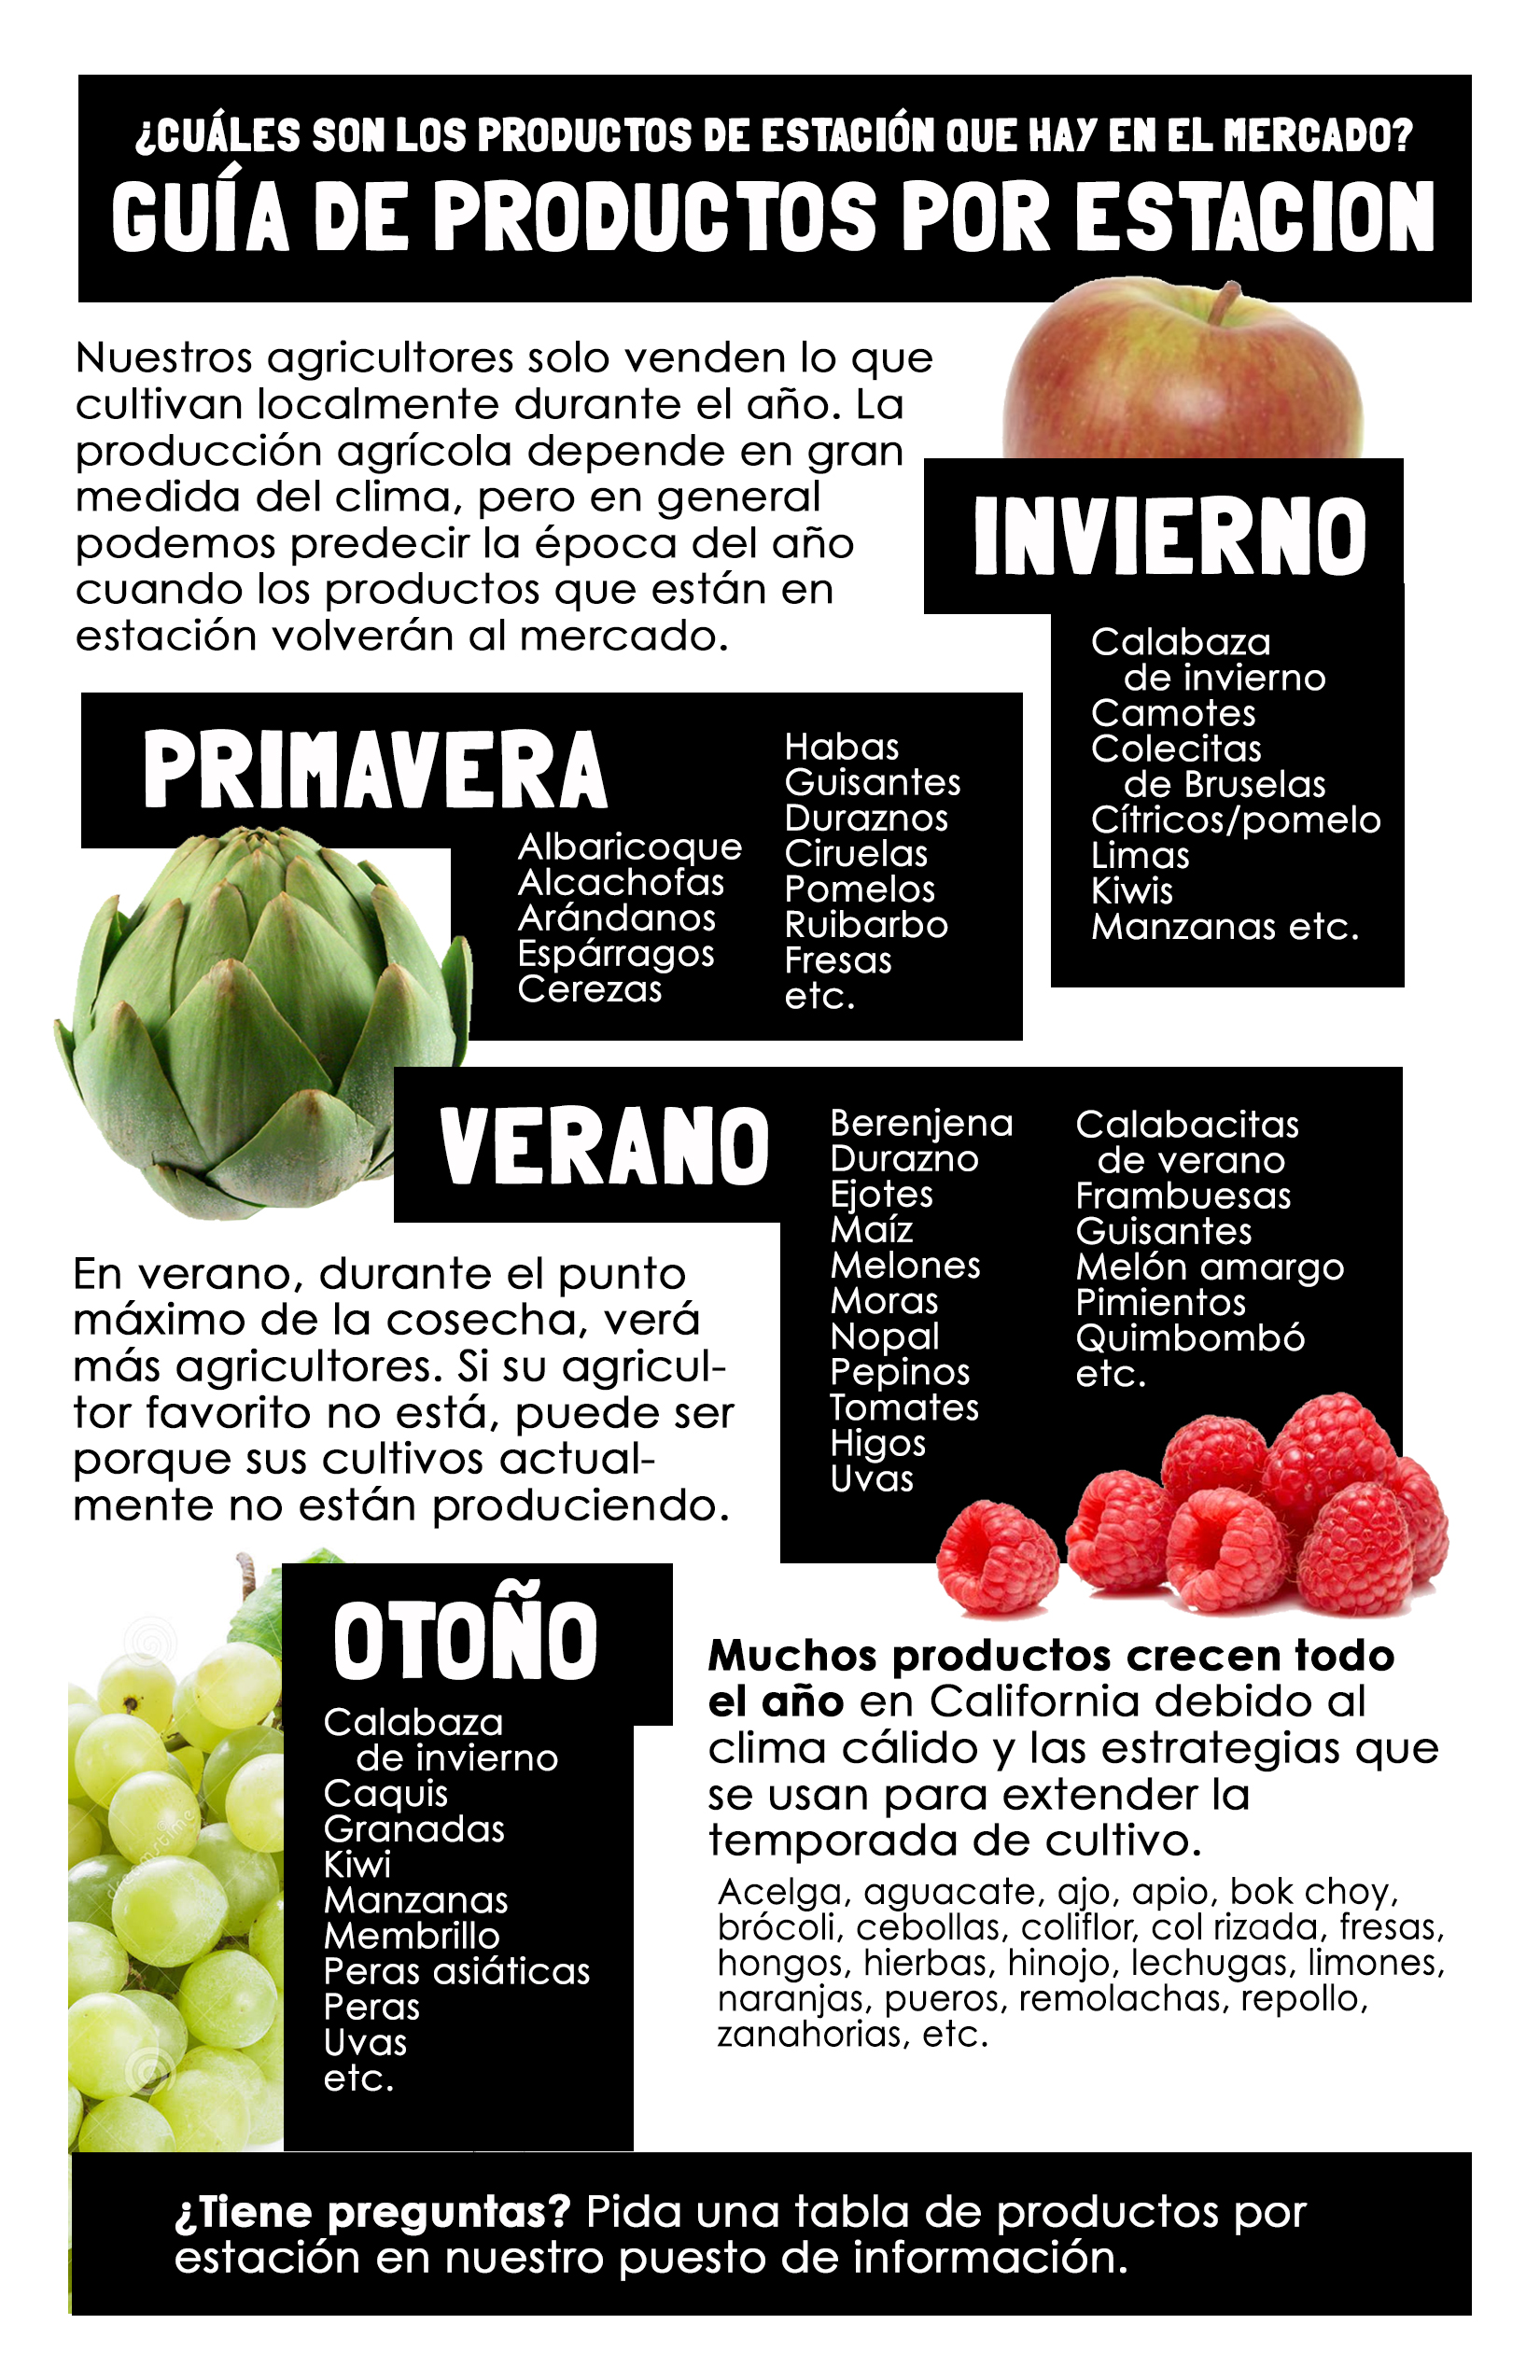 HOCFM Flier_Seasonality Guide_Spanish.jpg